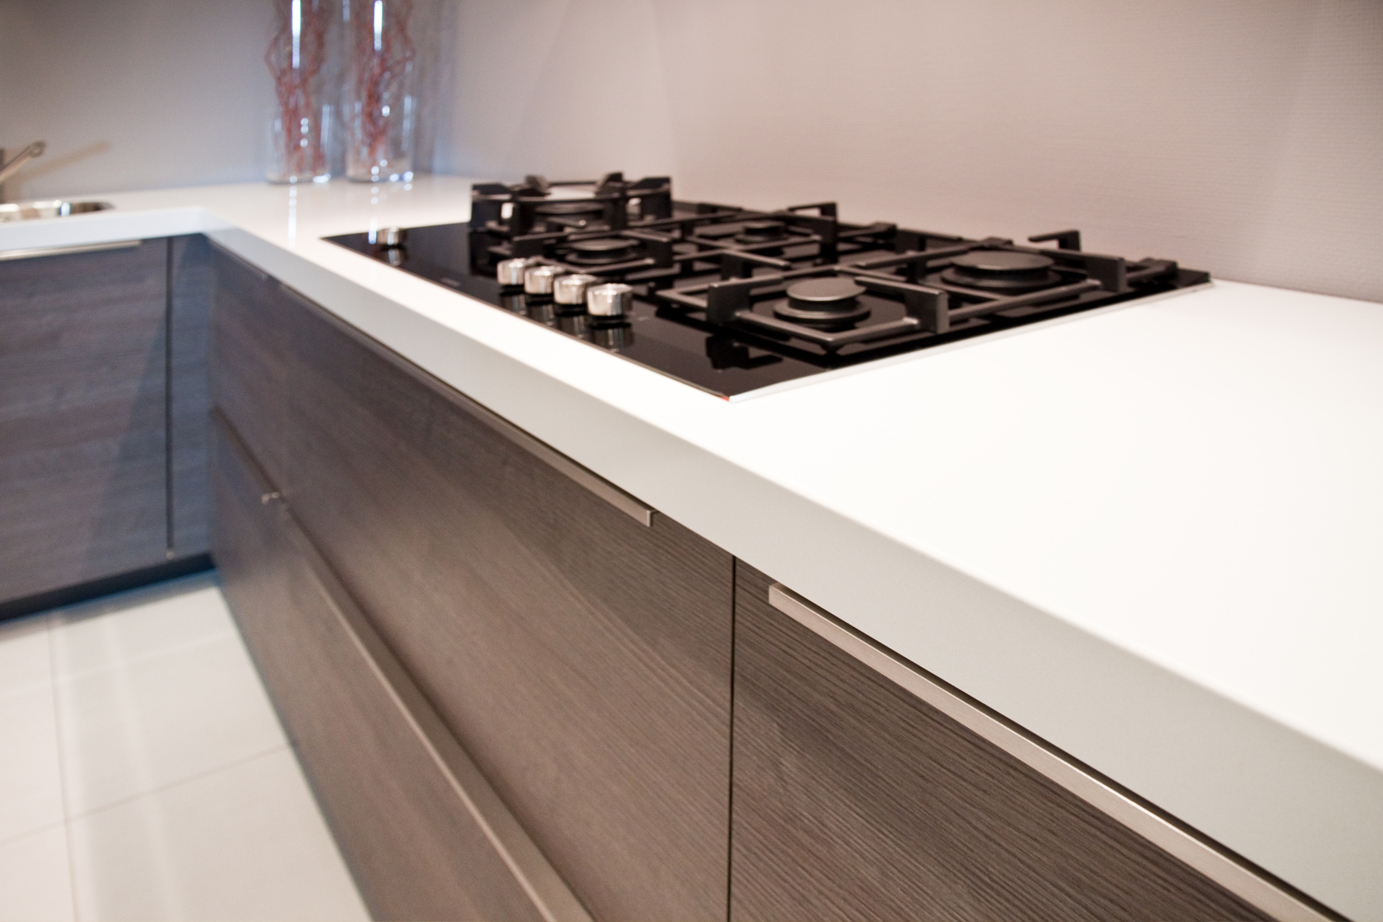 Keukenverlichting Zonder Bovenkasten : Keuken Zonder Bovenkastjes : bovenkasten keukens zonder bovenkasten